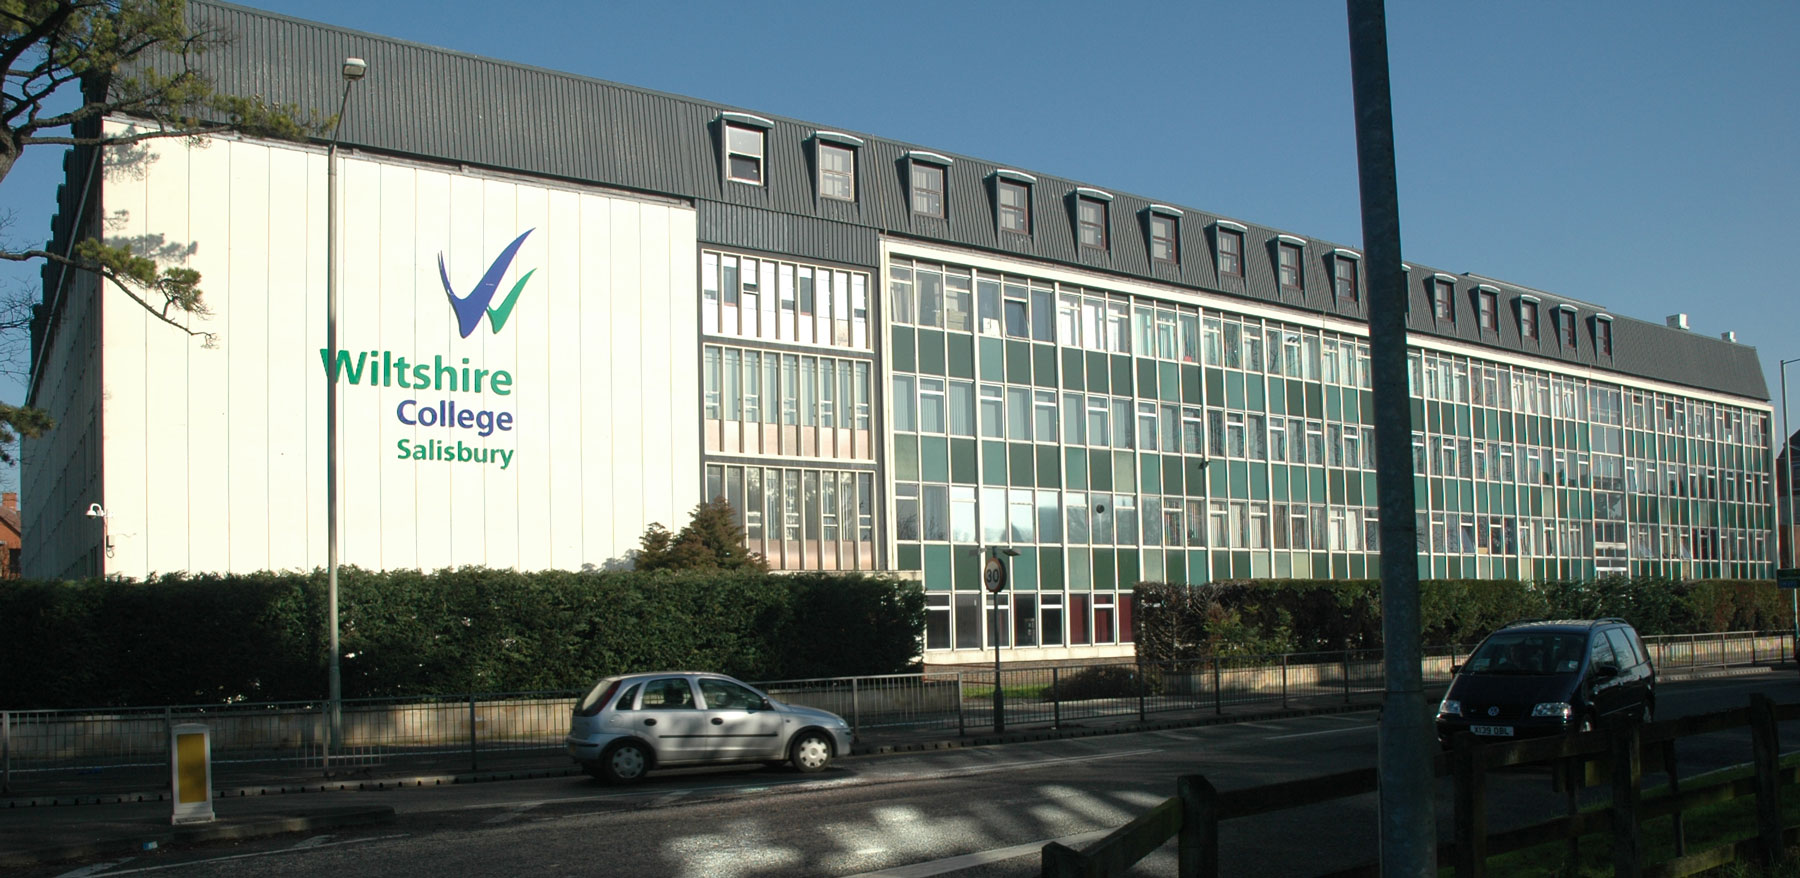 Avon & Wylie Buildings<br>Wiltshire College Salisbury